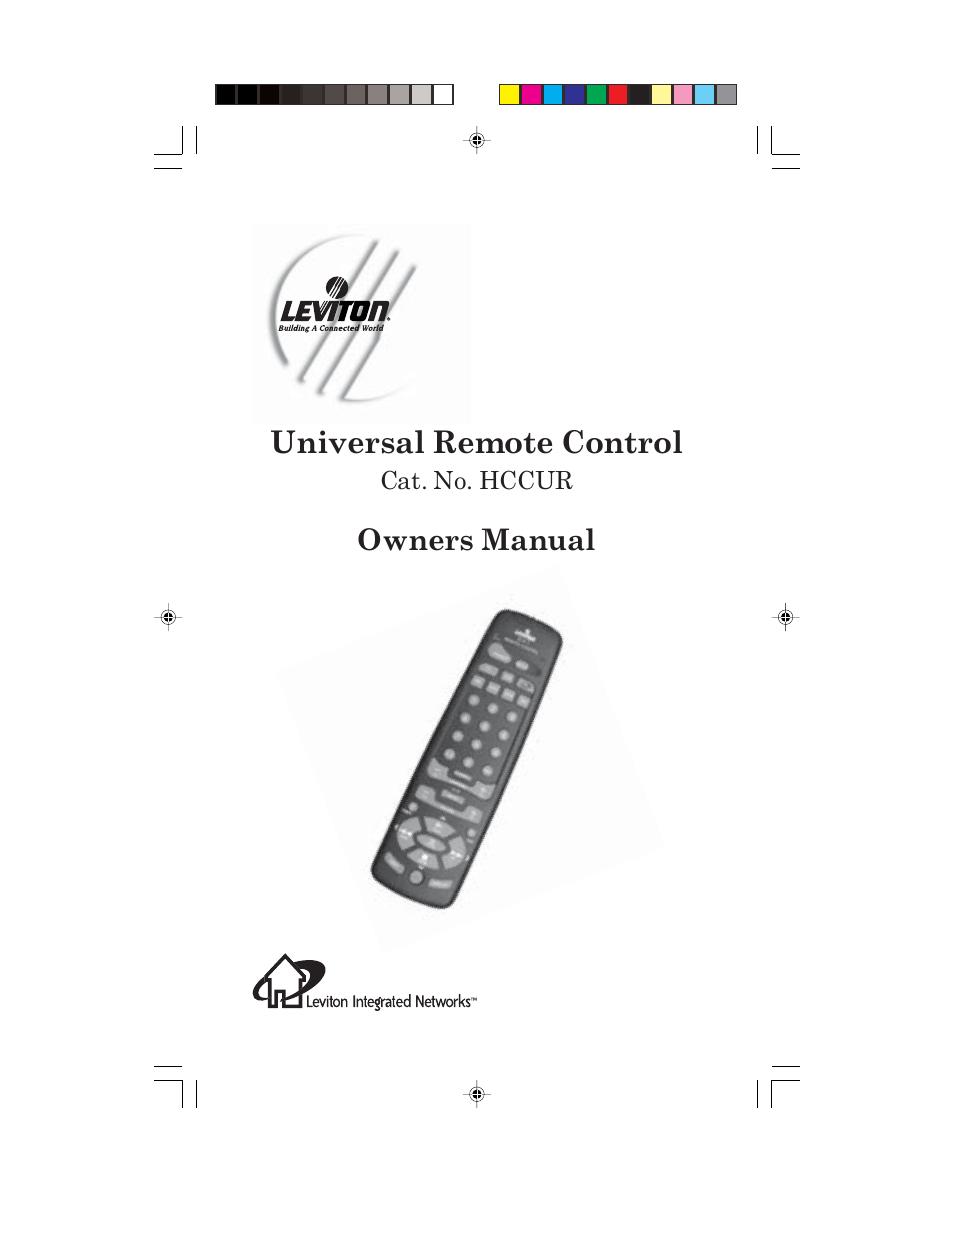 Universal Remote Control (URS) Remote control HCCUR User